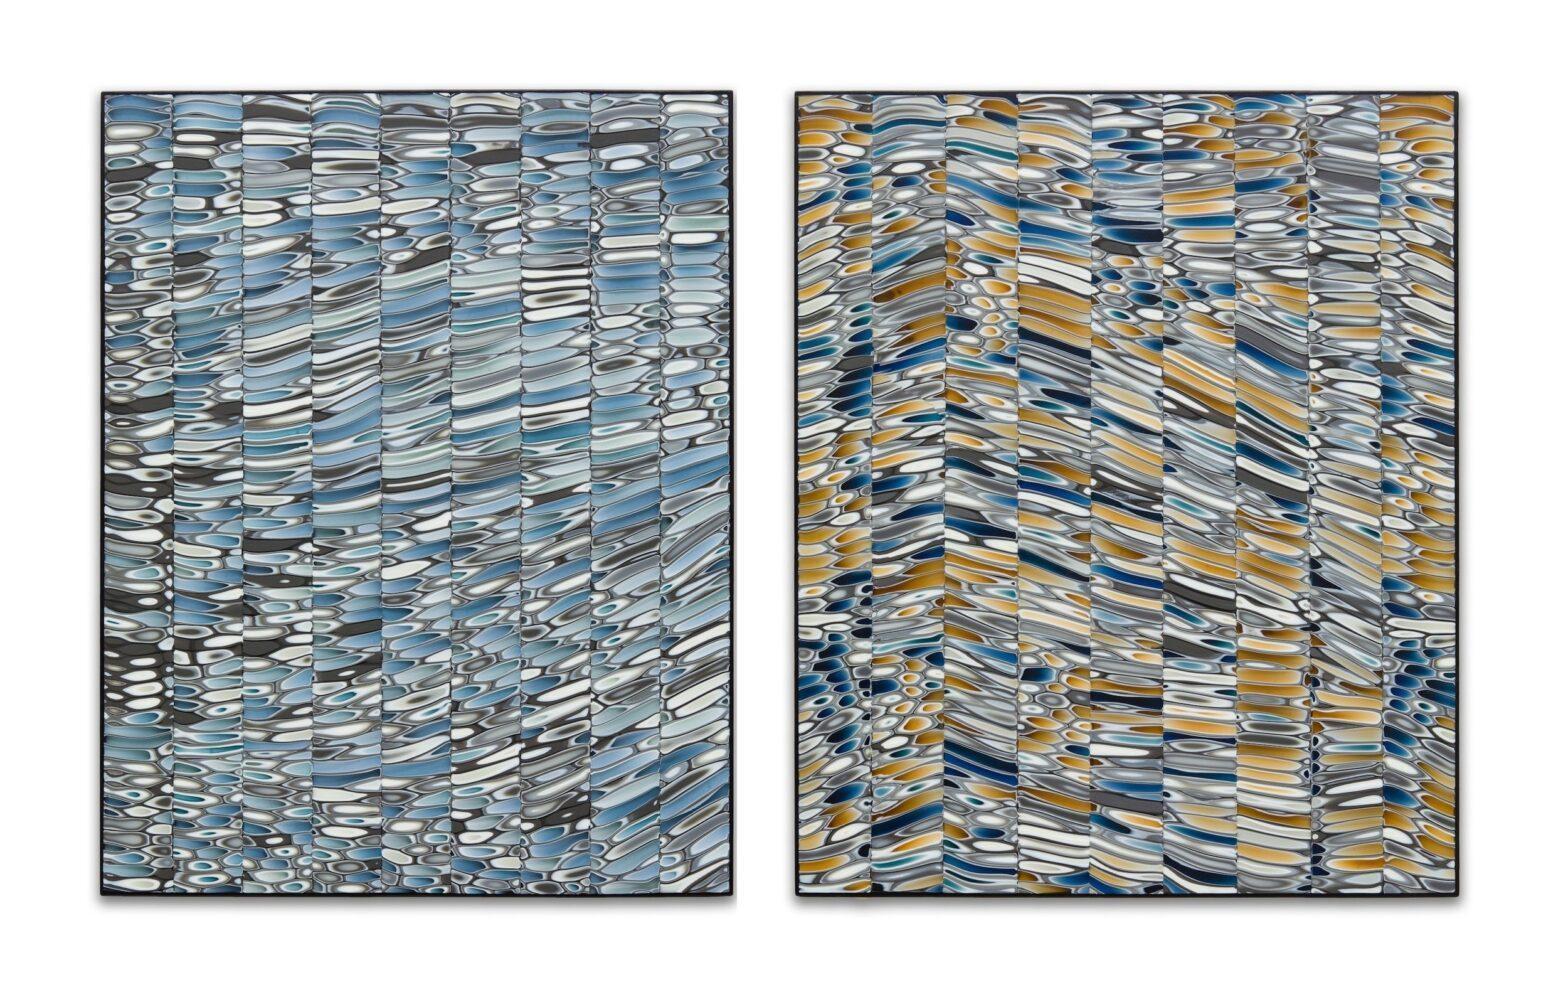 Nathan Sandberg: reinventing glass art